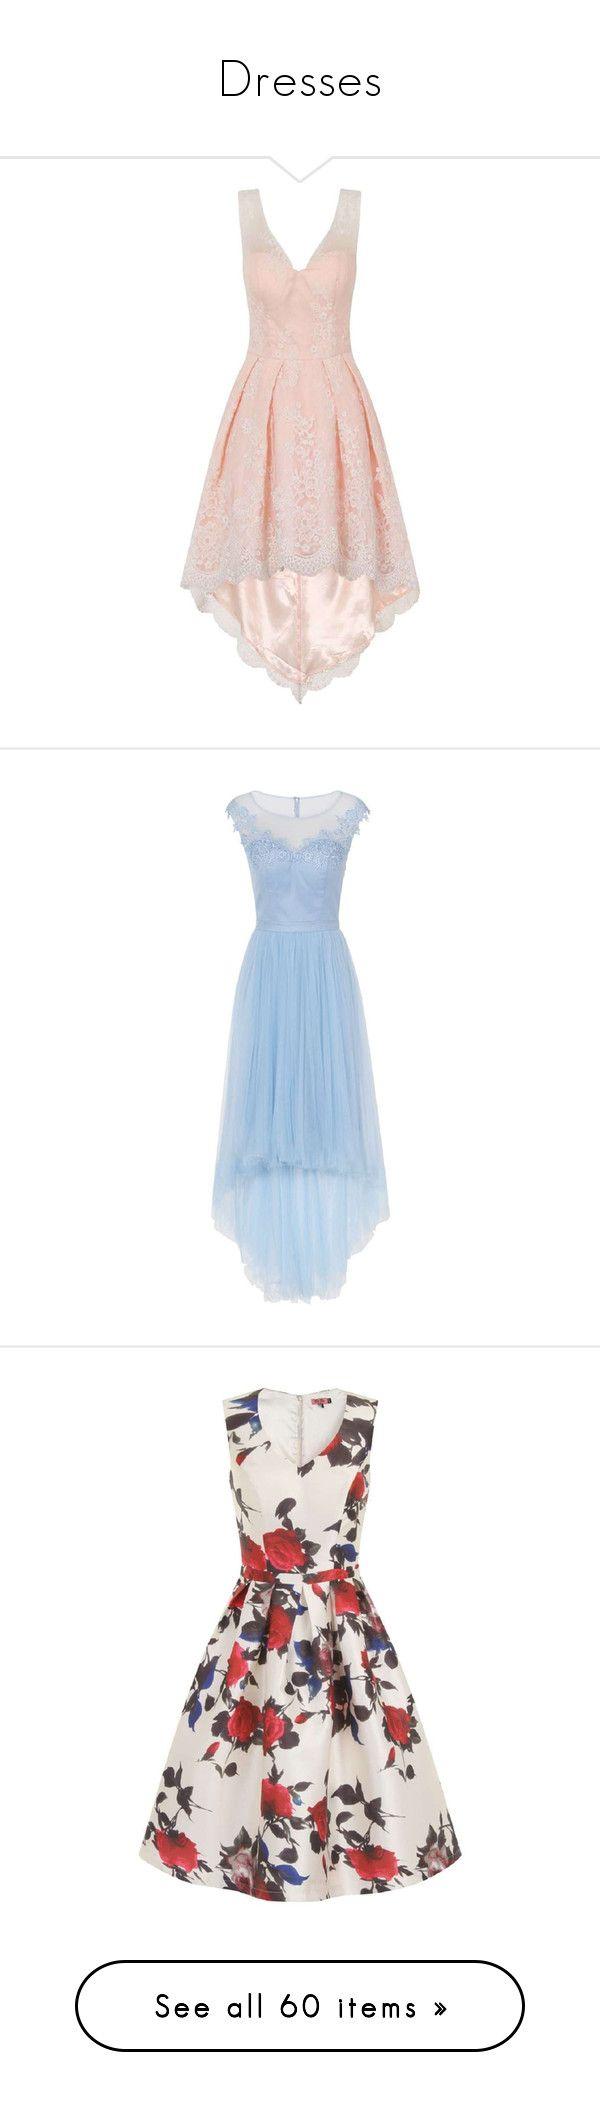 """Dresses"" by unicorn8cupcake ❤ liked on Polyvore featuring dresses, pink, mid calf dresses, pink dress, calf length dresses, full skirt midi dress, mullet dresses, blue, sheer dress and blue color dress"